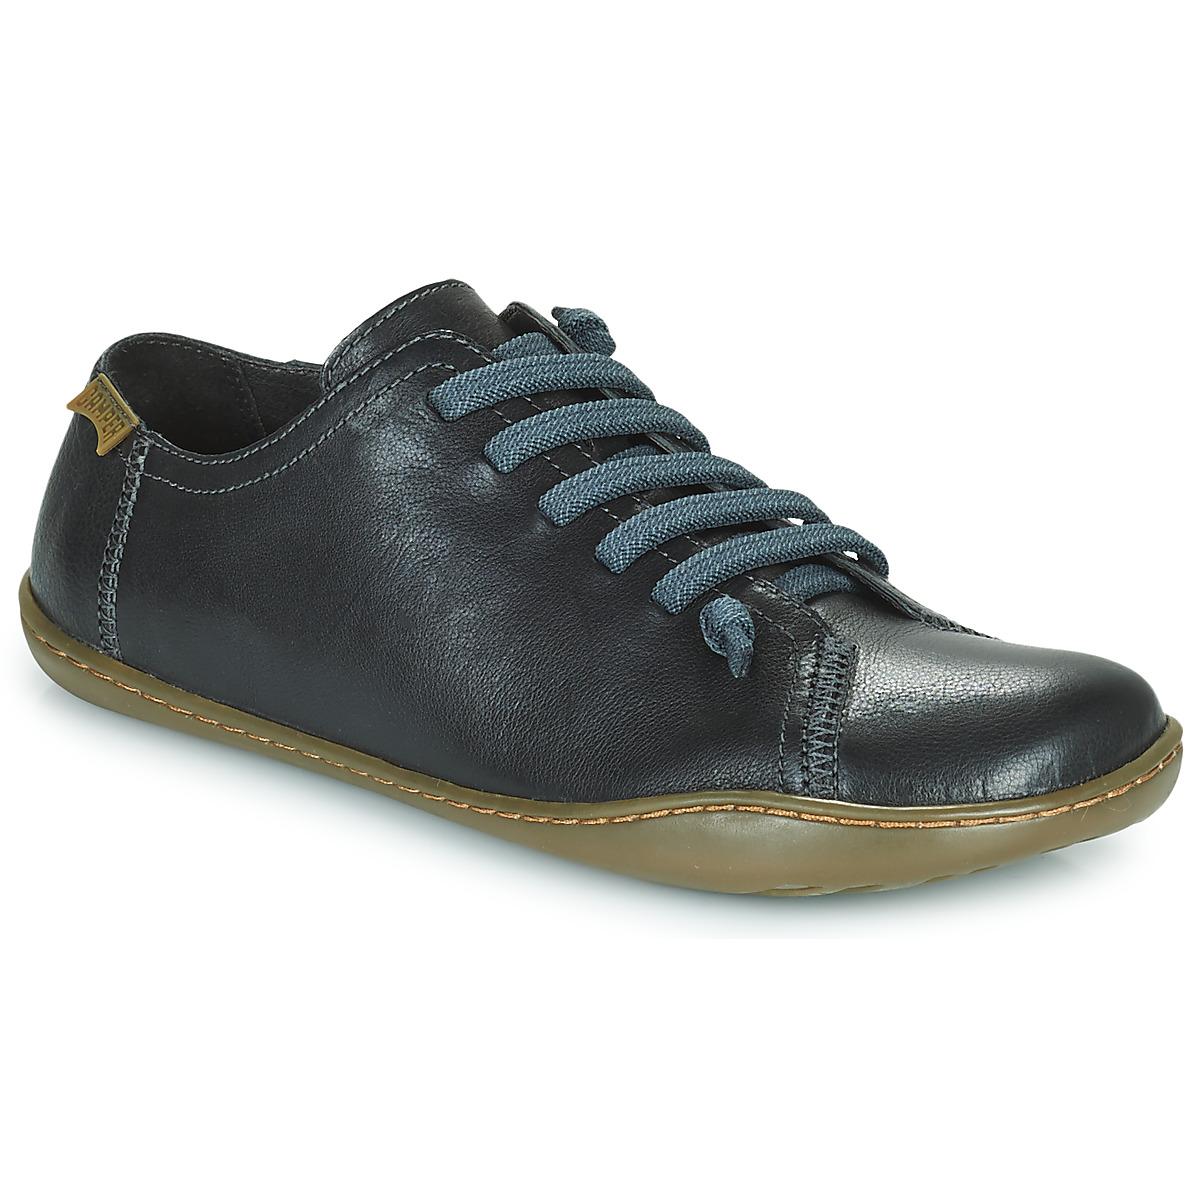 Pointure:EUR 39 Etnies Femme Chaussures/Baskets Scout Camper Chaussures Pegaso Camper soldes S2pHgGAKnQ